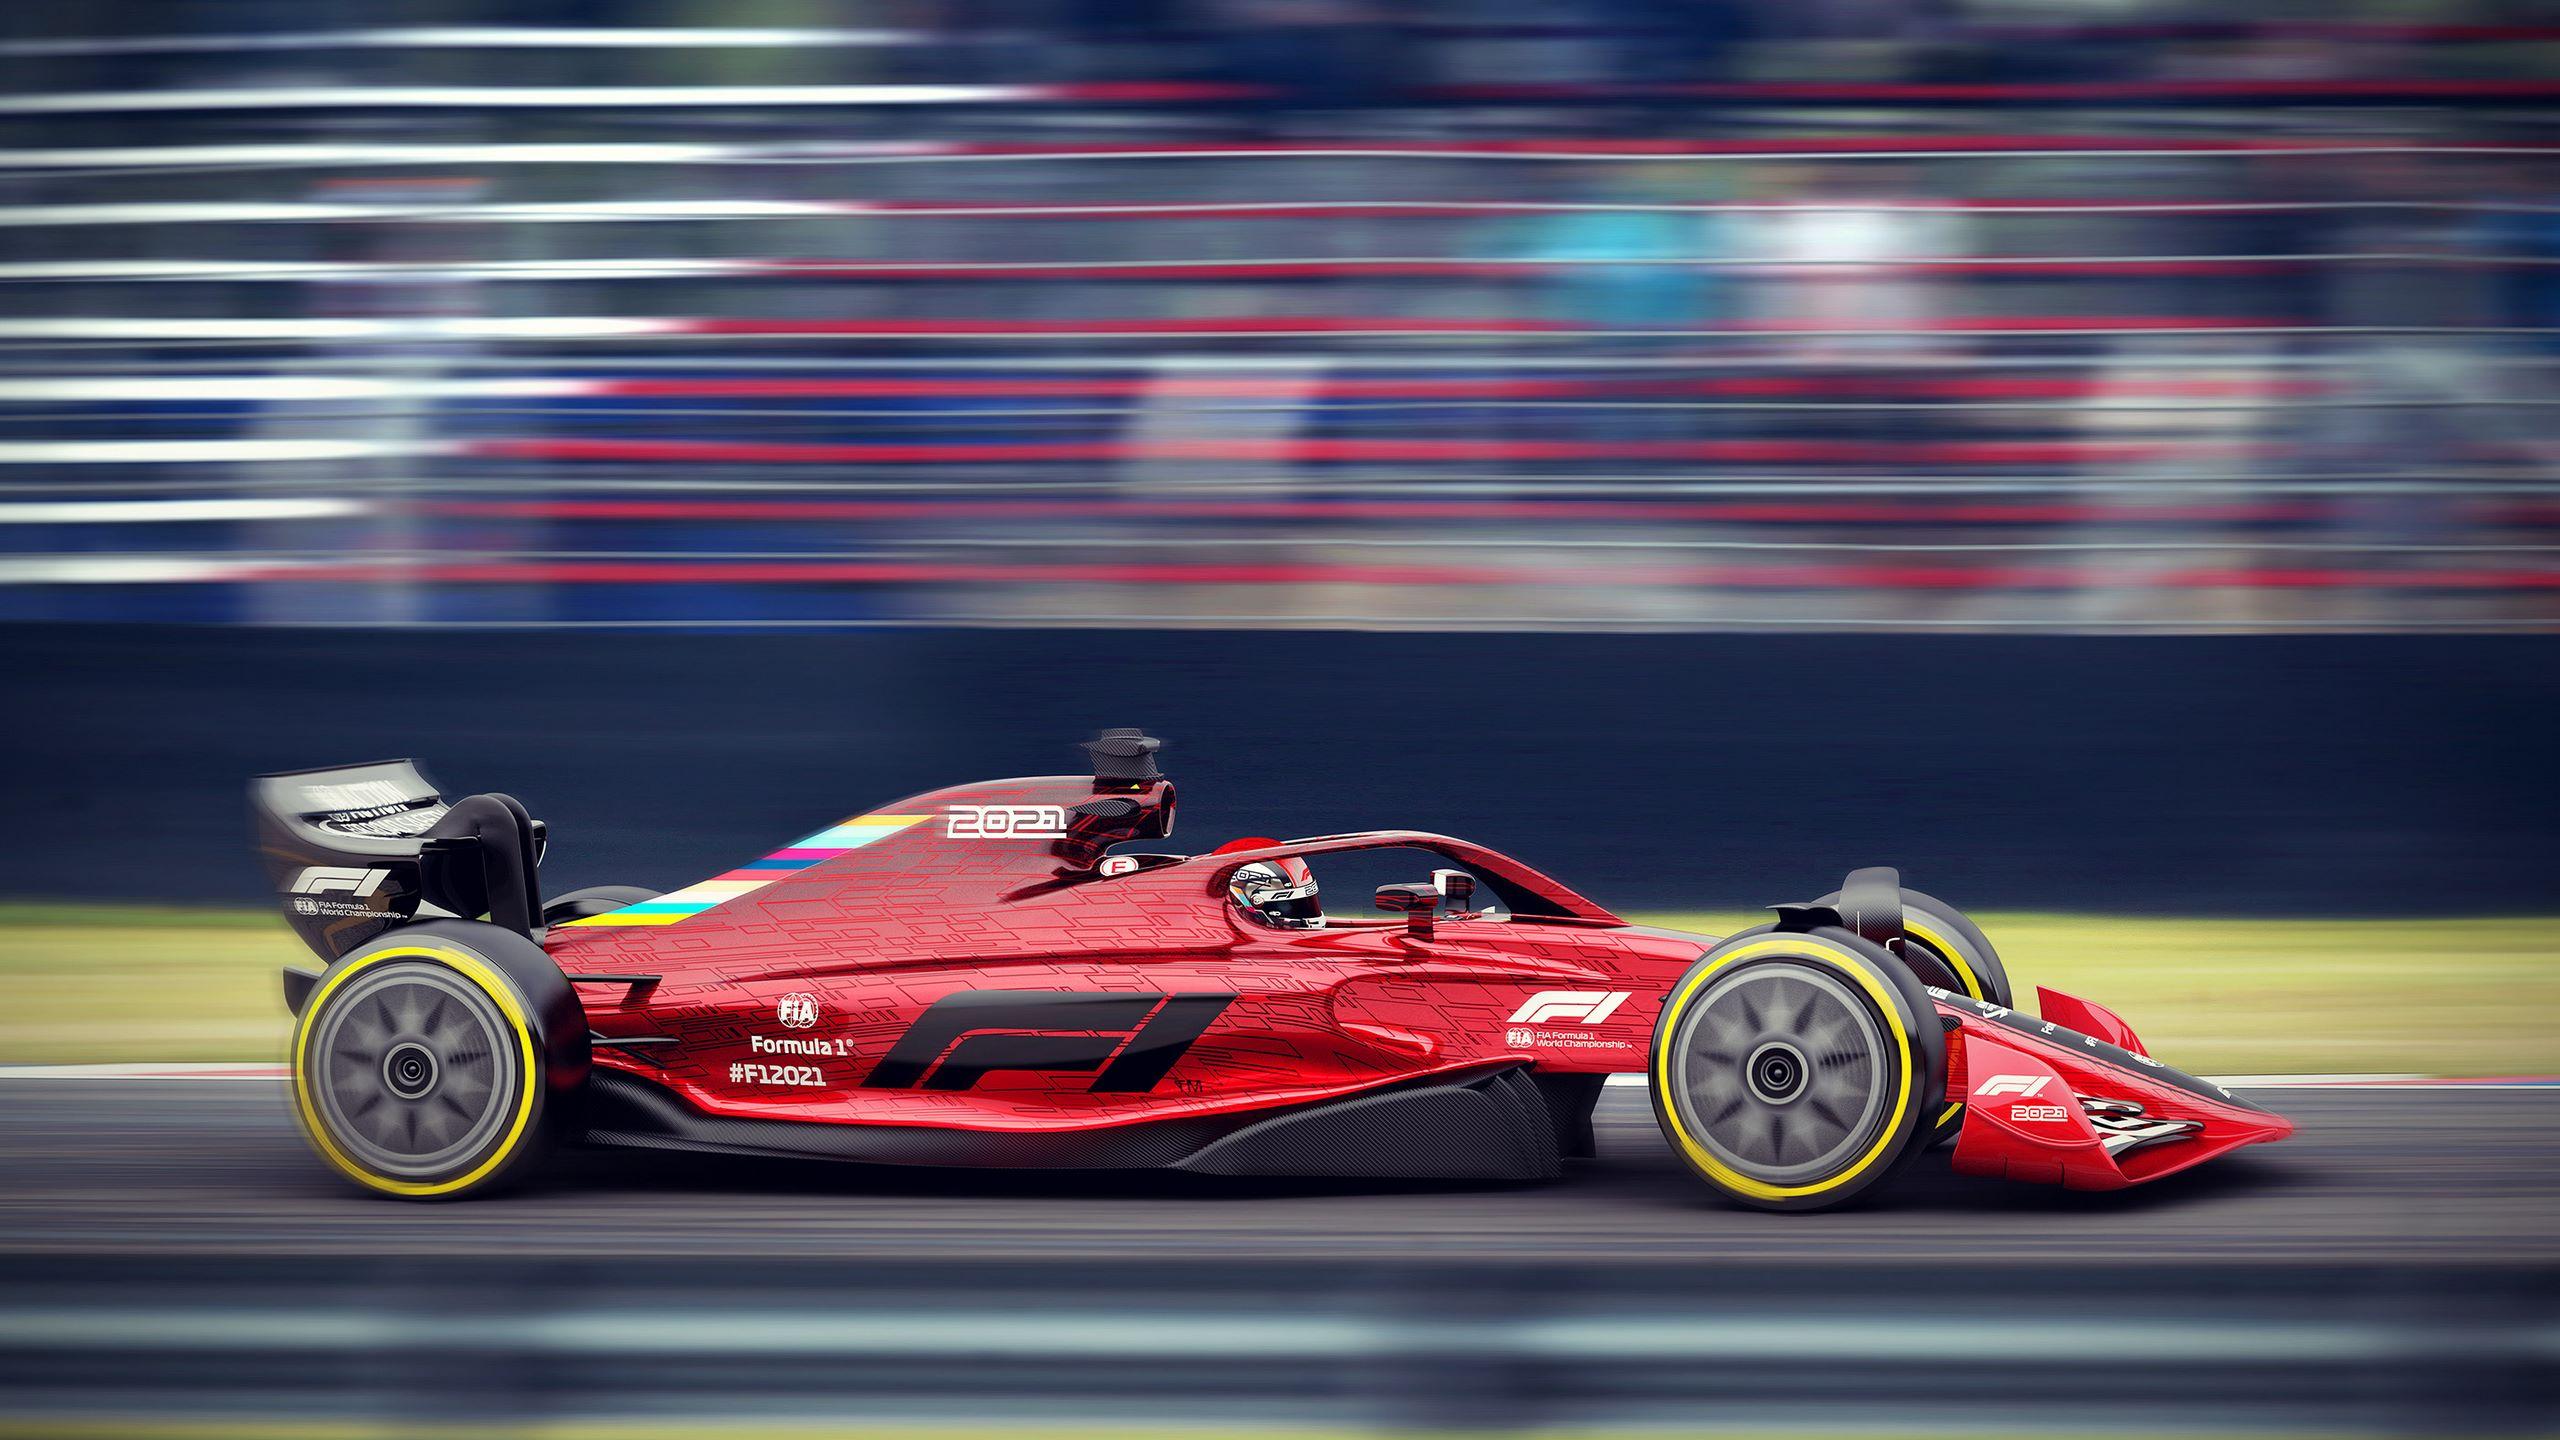 2021-formula-1-race-car-rendering f1 (8)